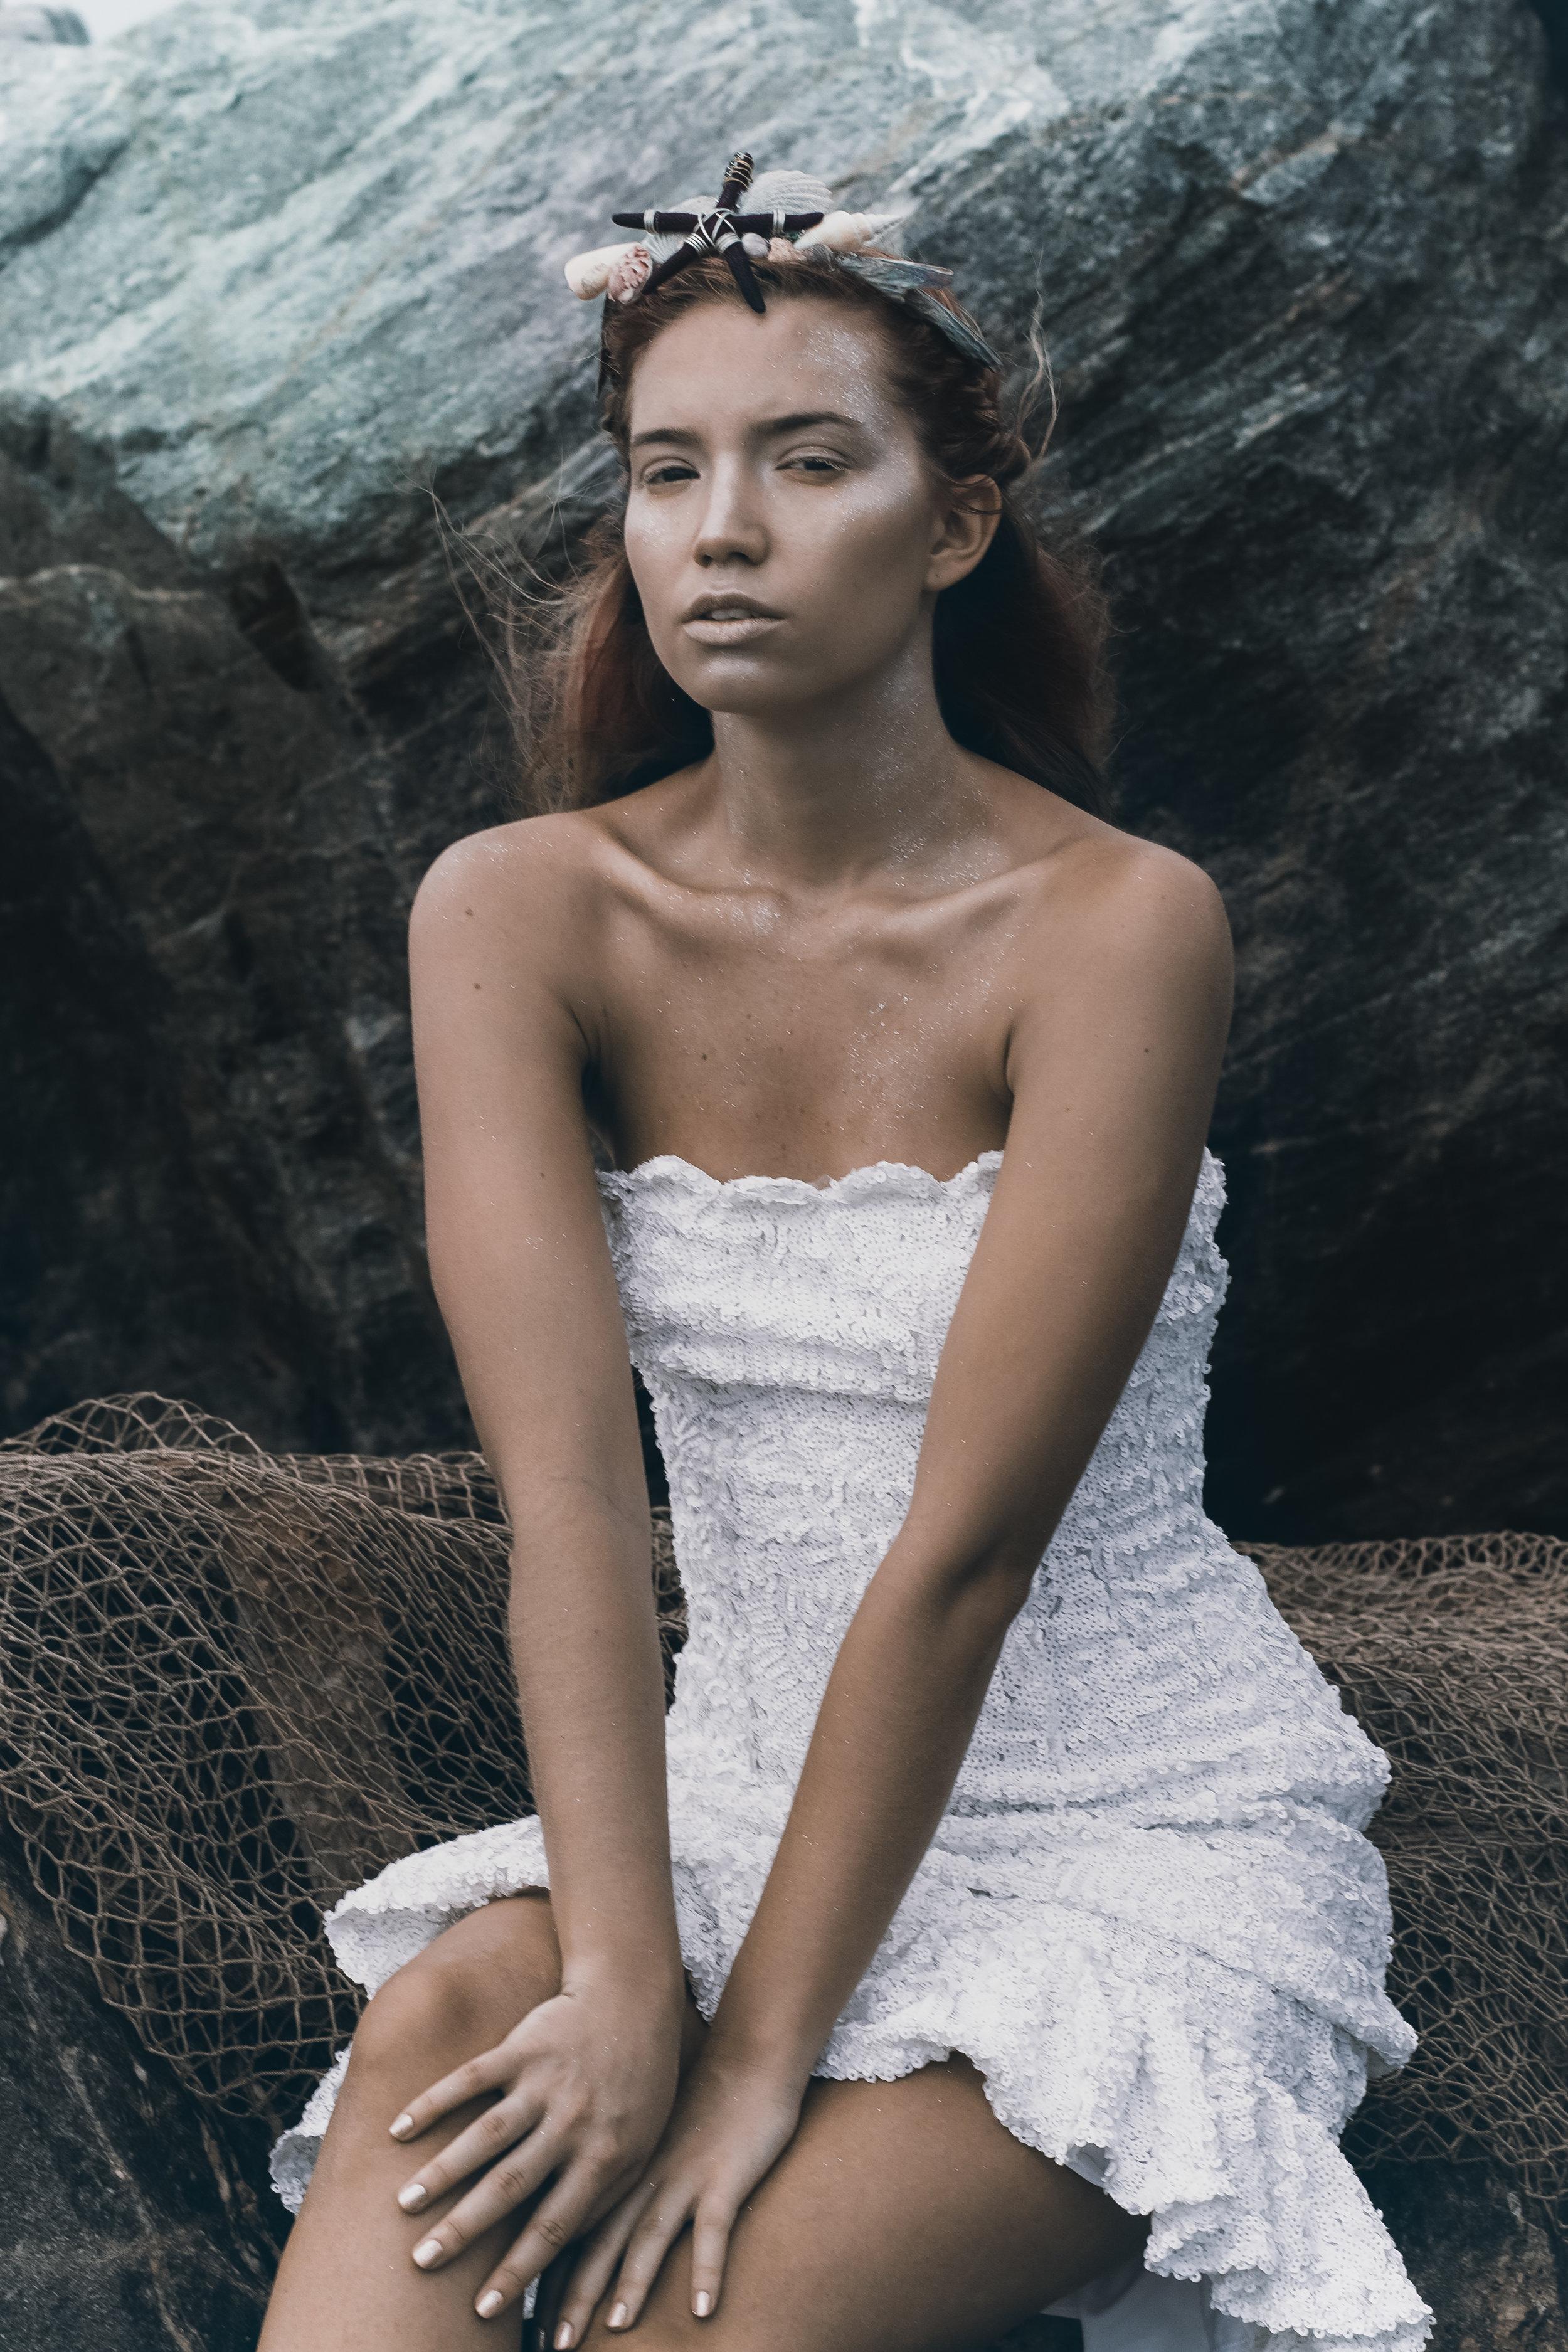 mermaid_desireemarie_vaniaelisephotography--12.jpg